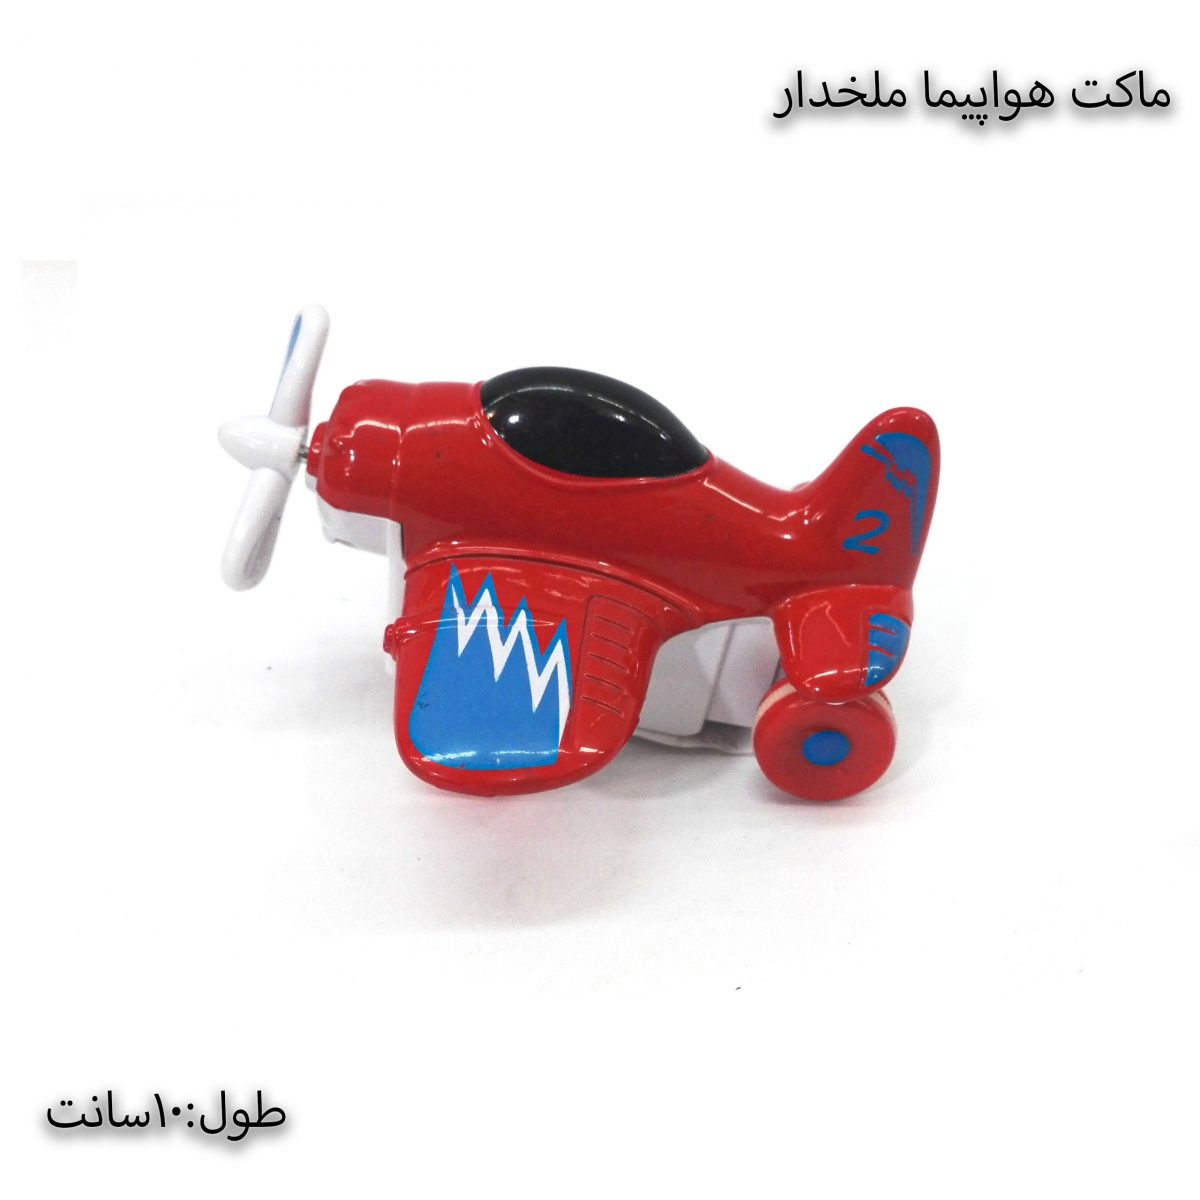 ماکت هواپیما ملخدار